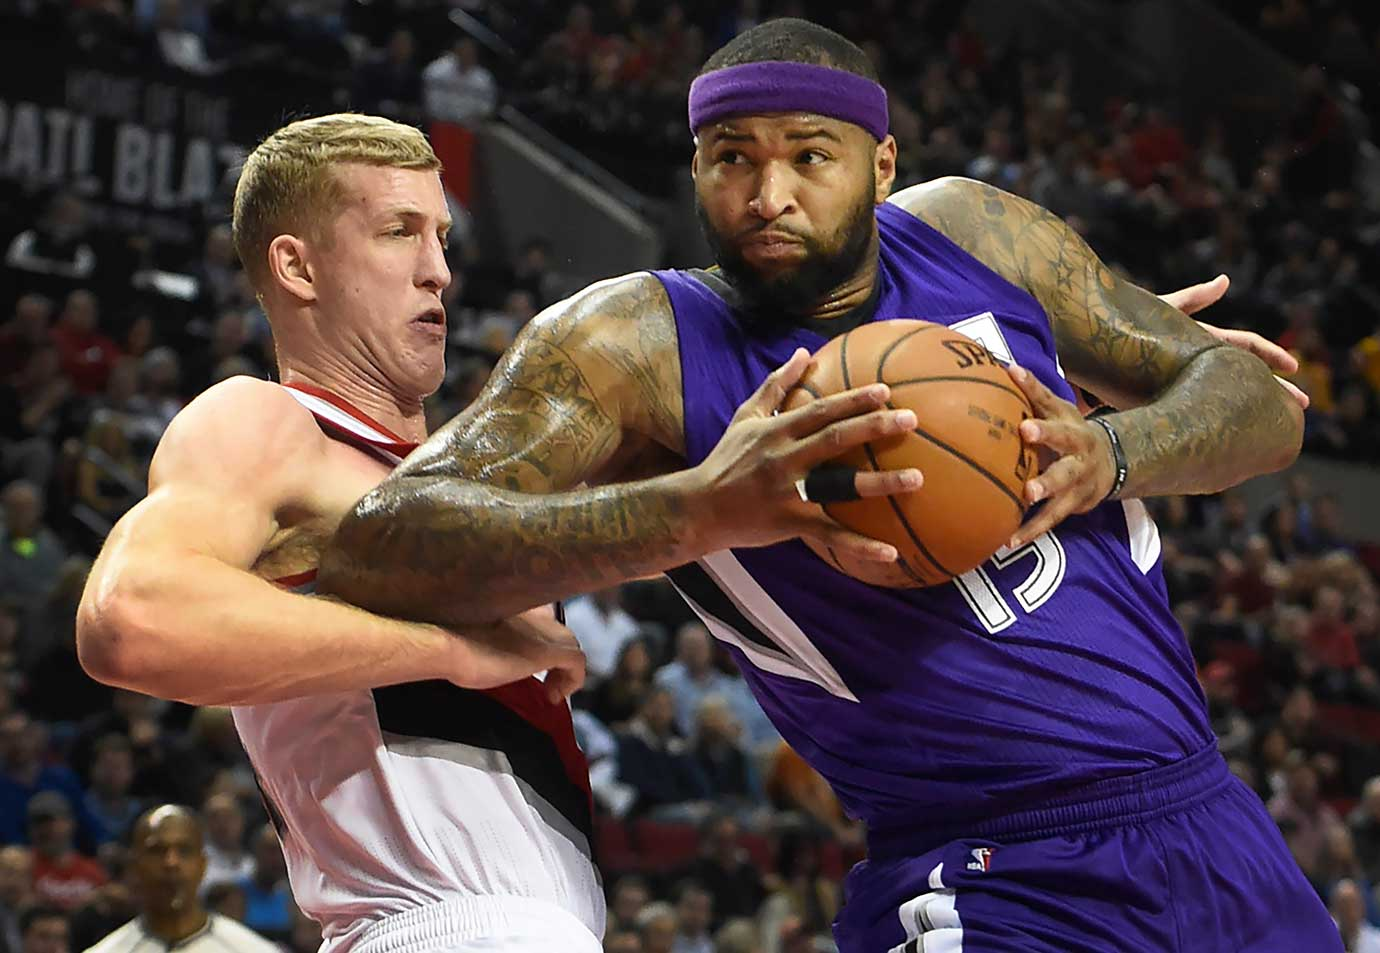 Sacramento Kings center DeMarcus Cousins drives to the basket on Portland Trail Blazers center Mason Plumlee in Portland, Ore.